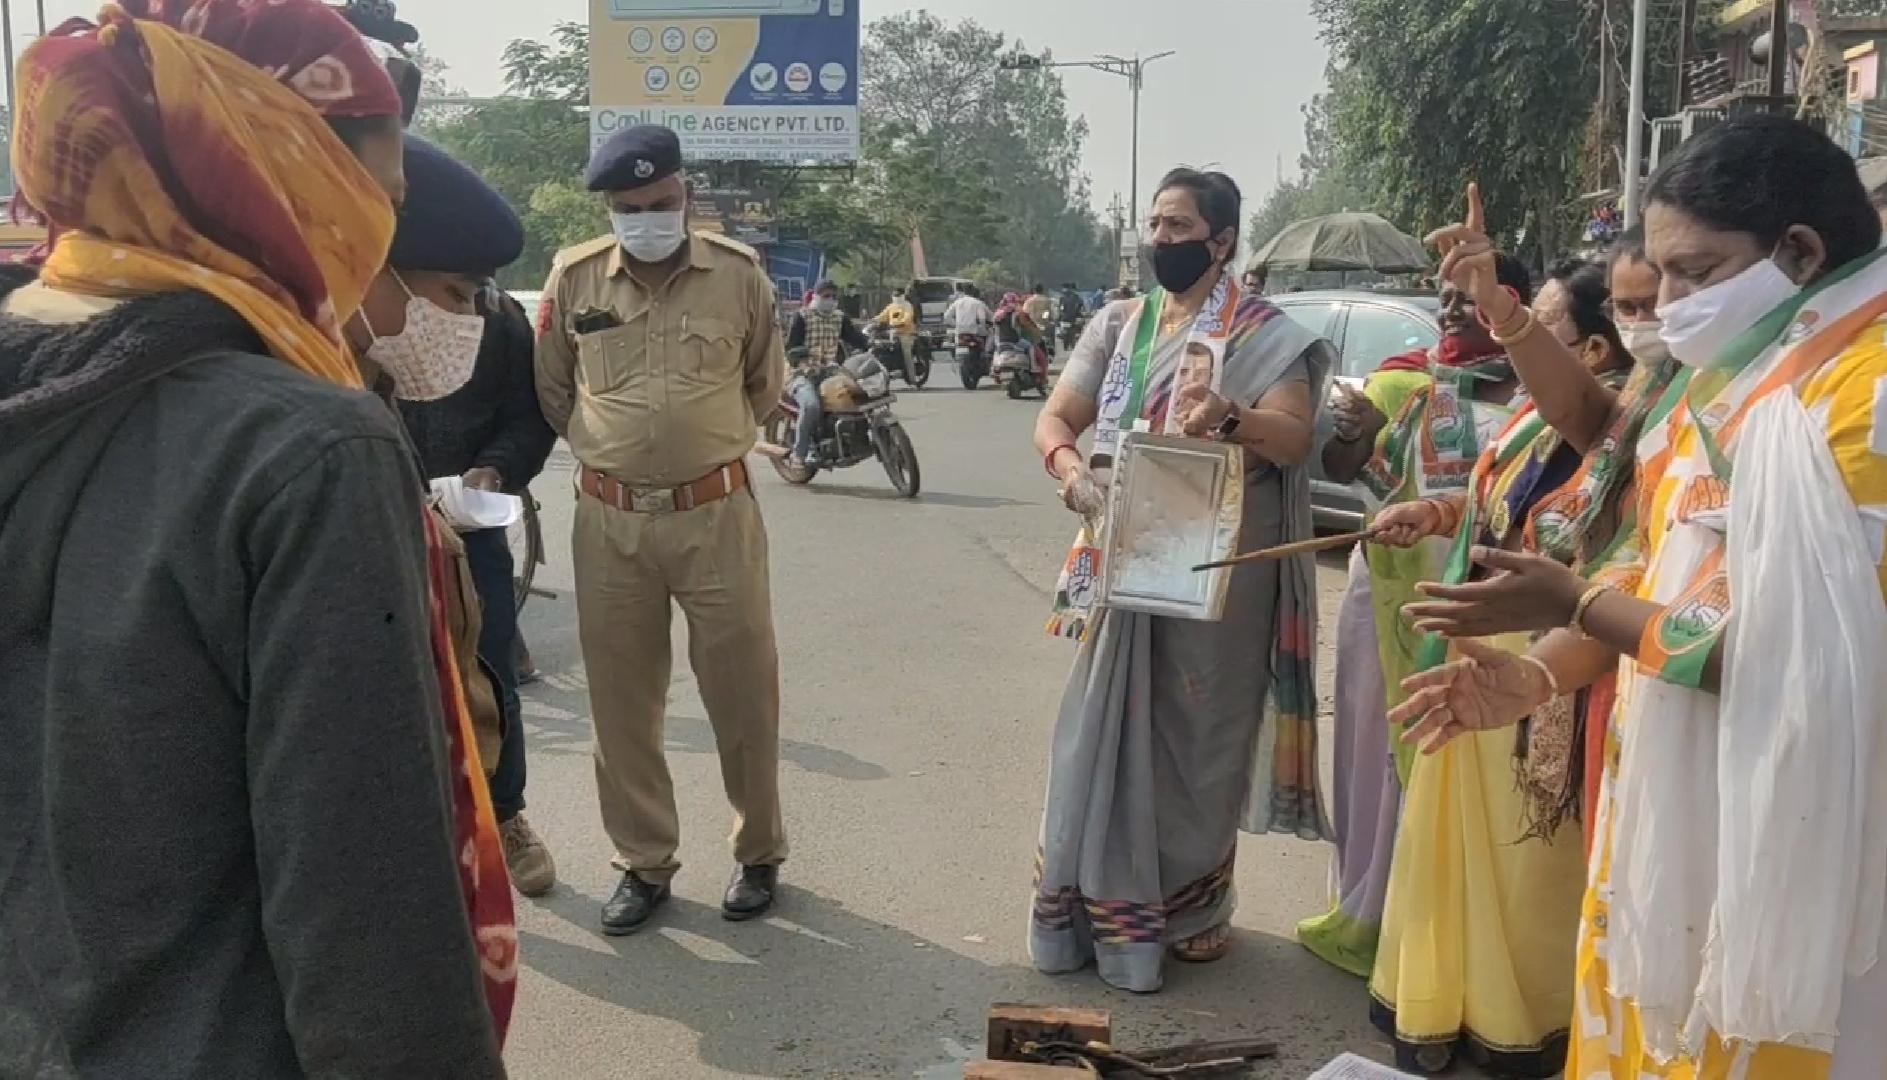 #Bharuch : મોંઘવારીનો અનોખો વિરોધ - જાહેરમાં સળગાવ્યા ચૂલા, કોંગ્રેસ પાસે વિરોધ માટે પણ કાર્યકરો નહિ